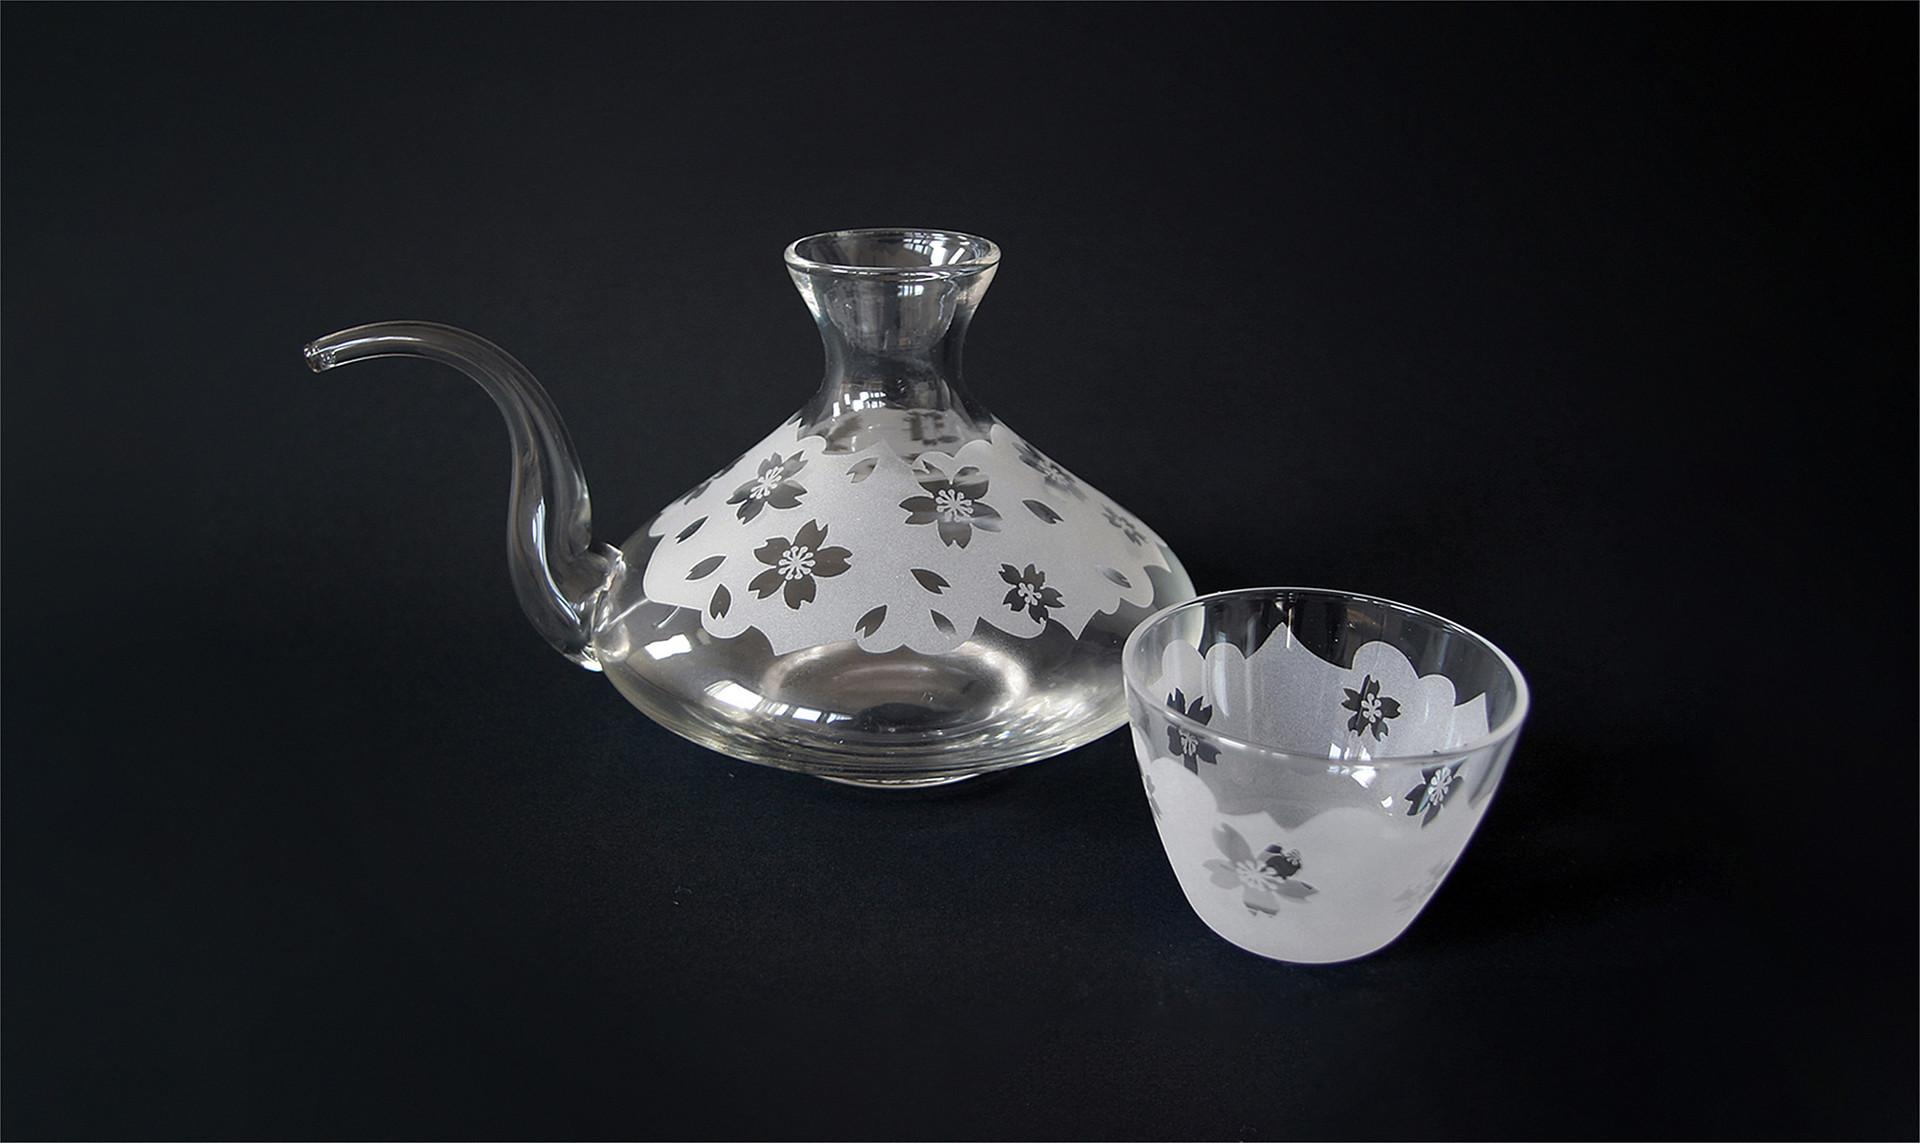 鈴木淳子 創作彫刻ガラス工芸